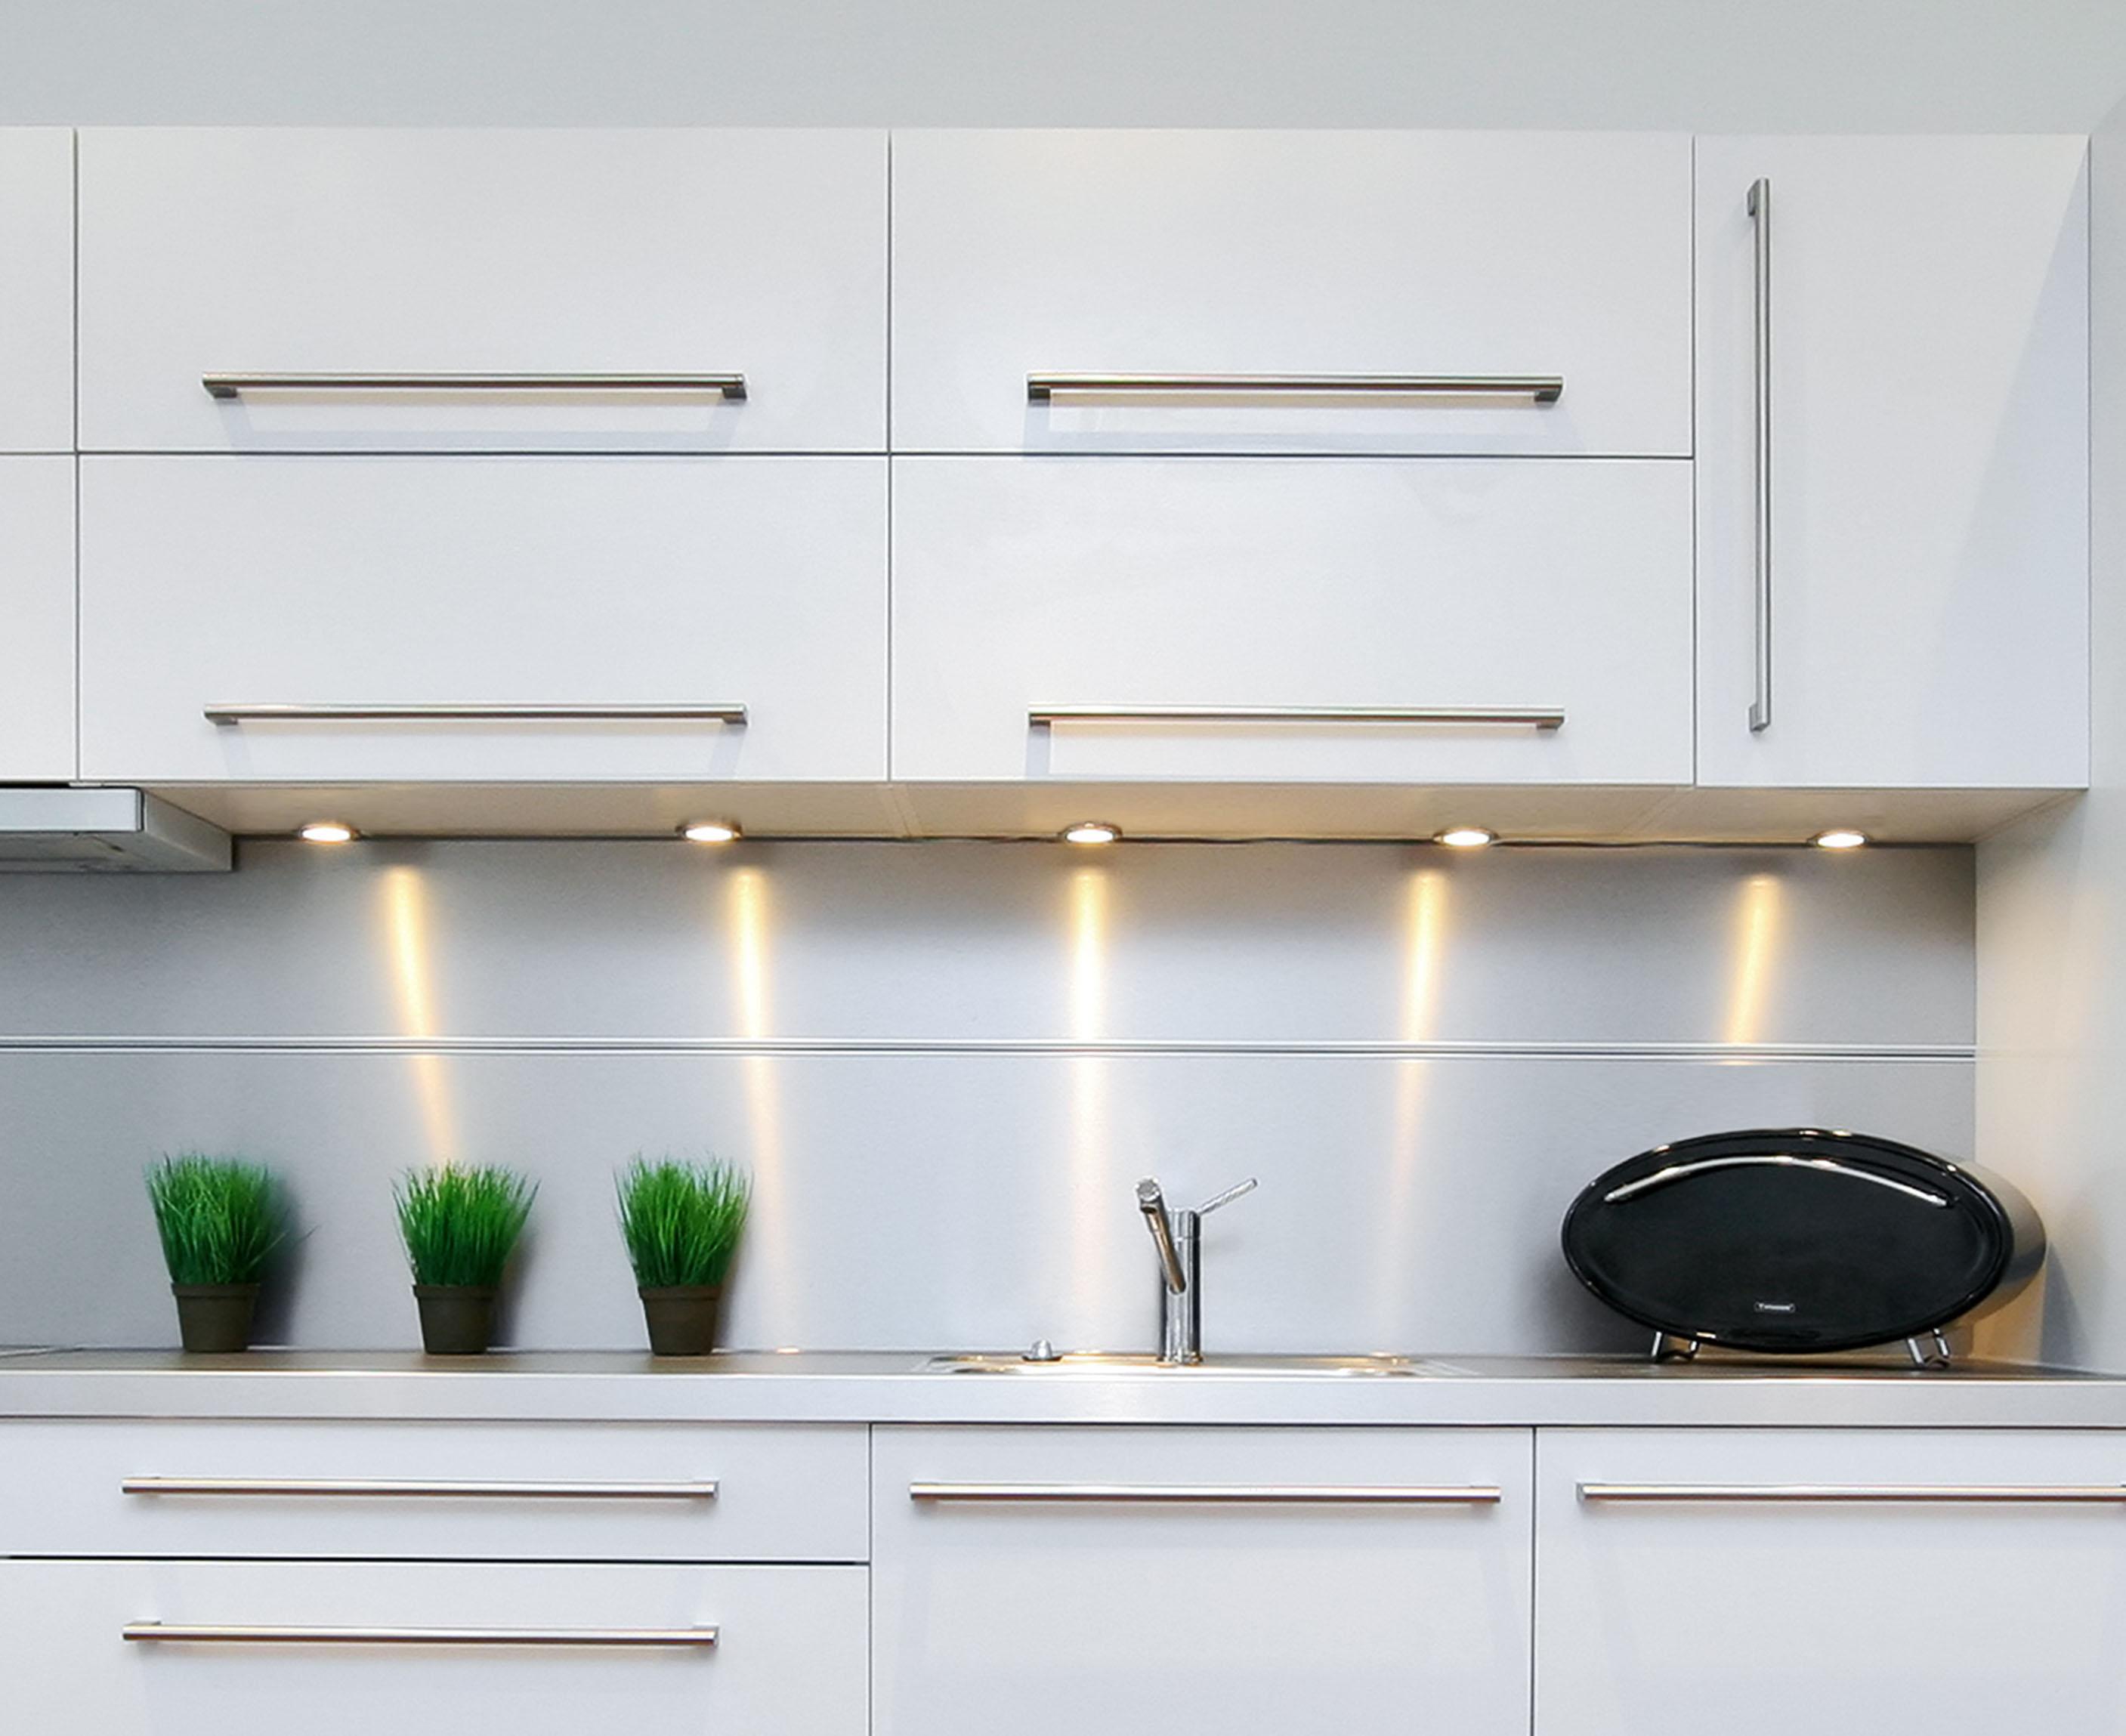 Lampy Podszafkowe Kuchenne Q Housepl